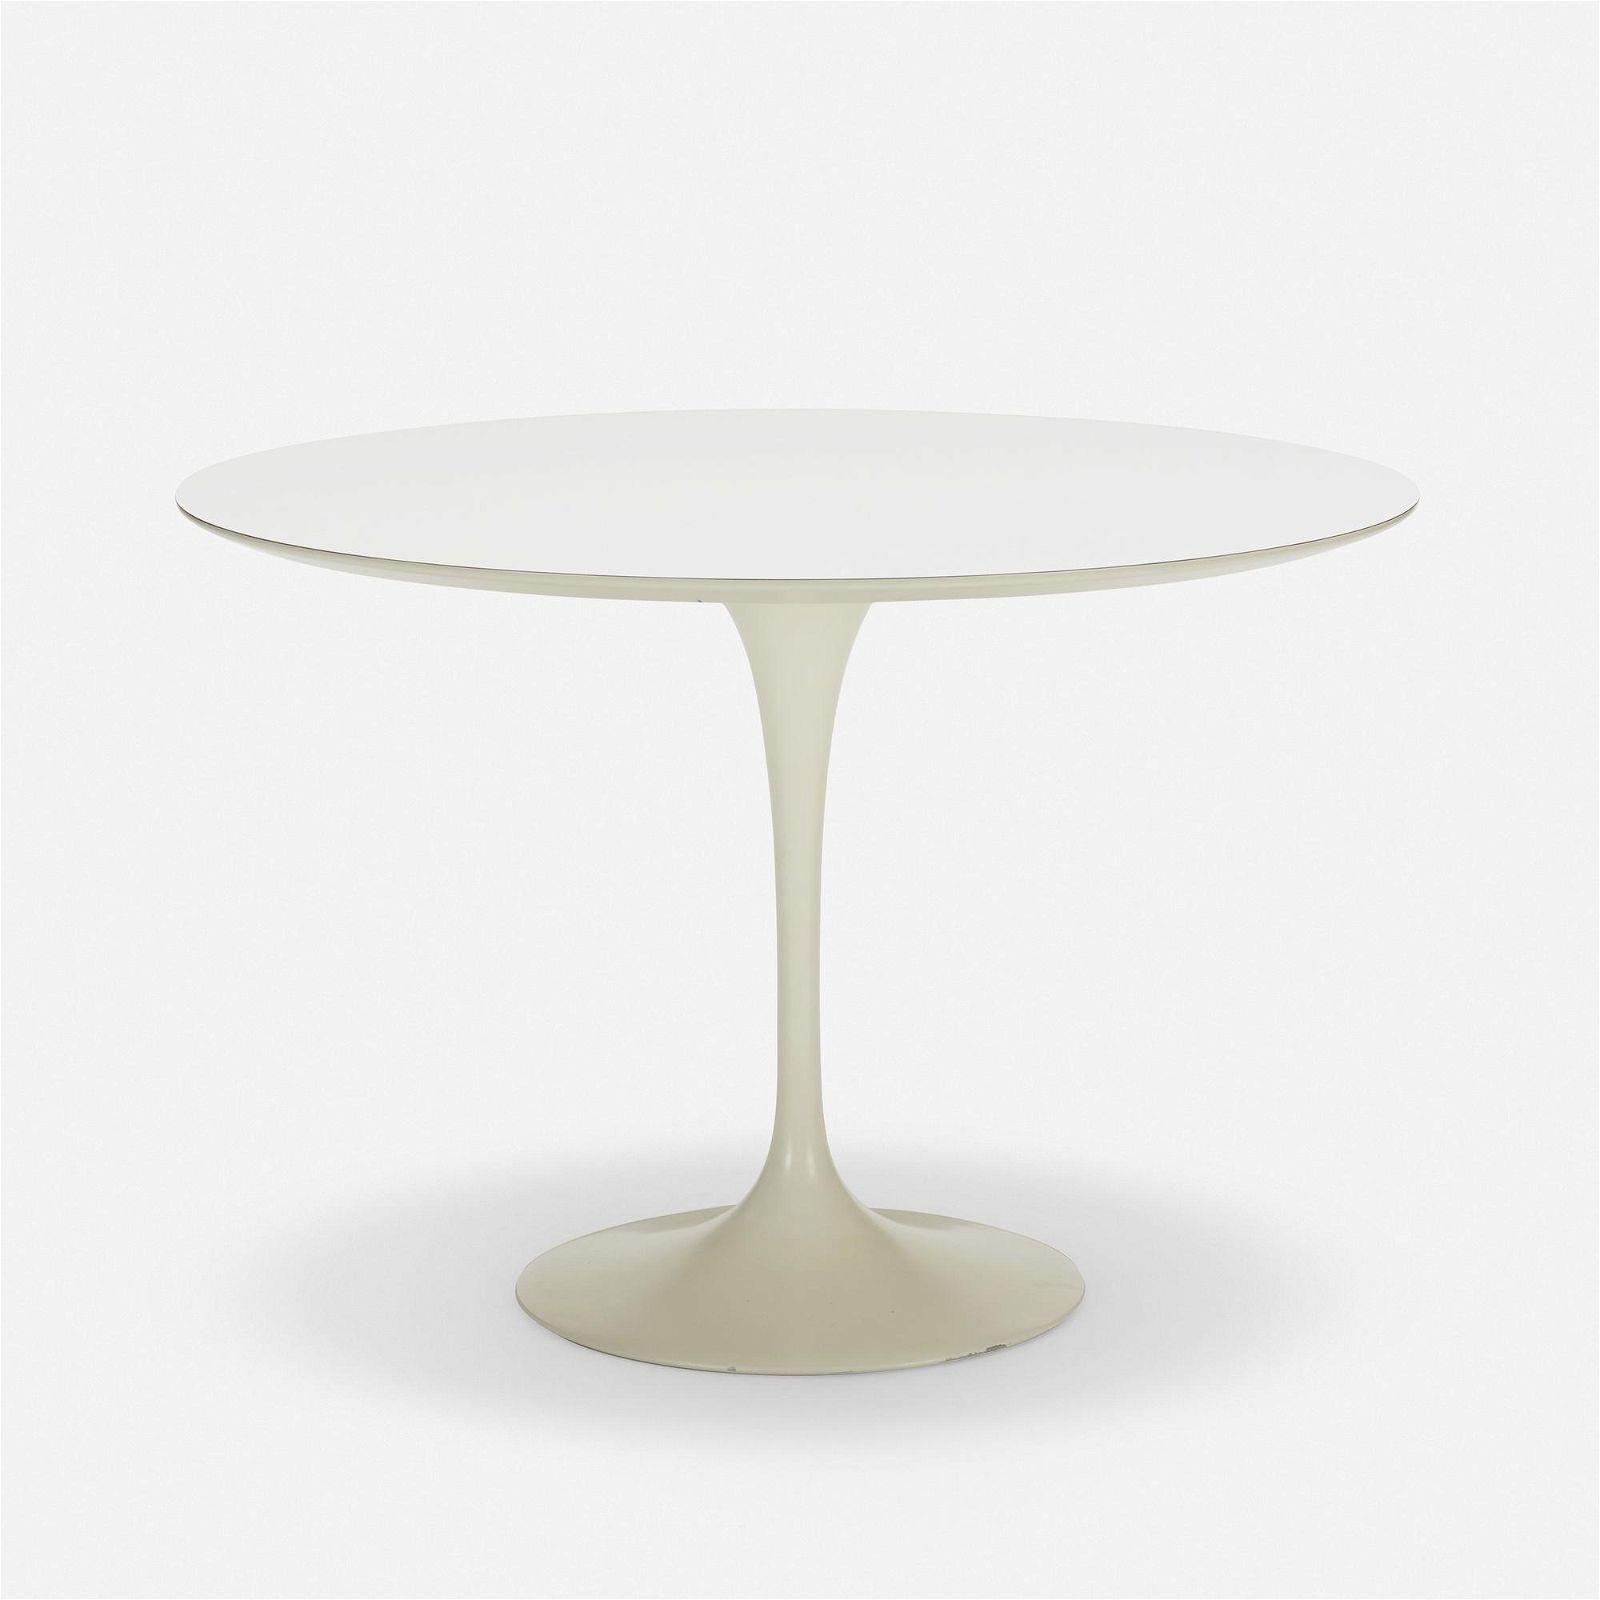 Eero Saarinen, Tulip dining table, model 173F